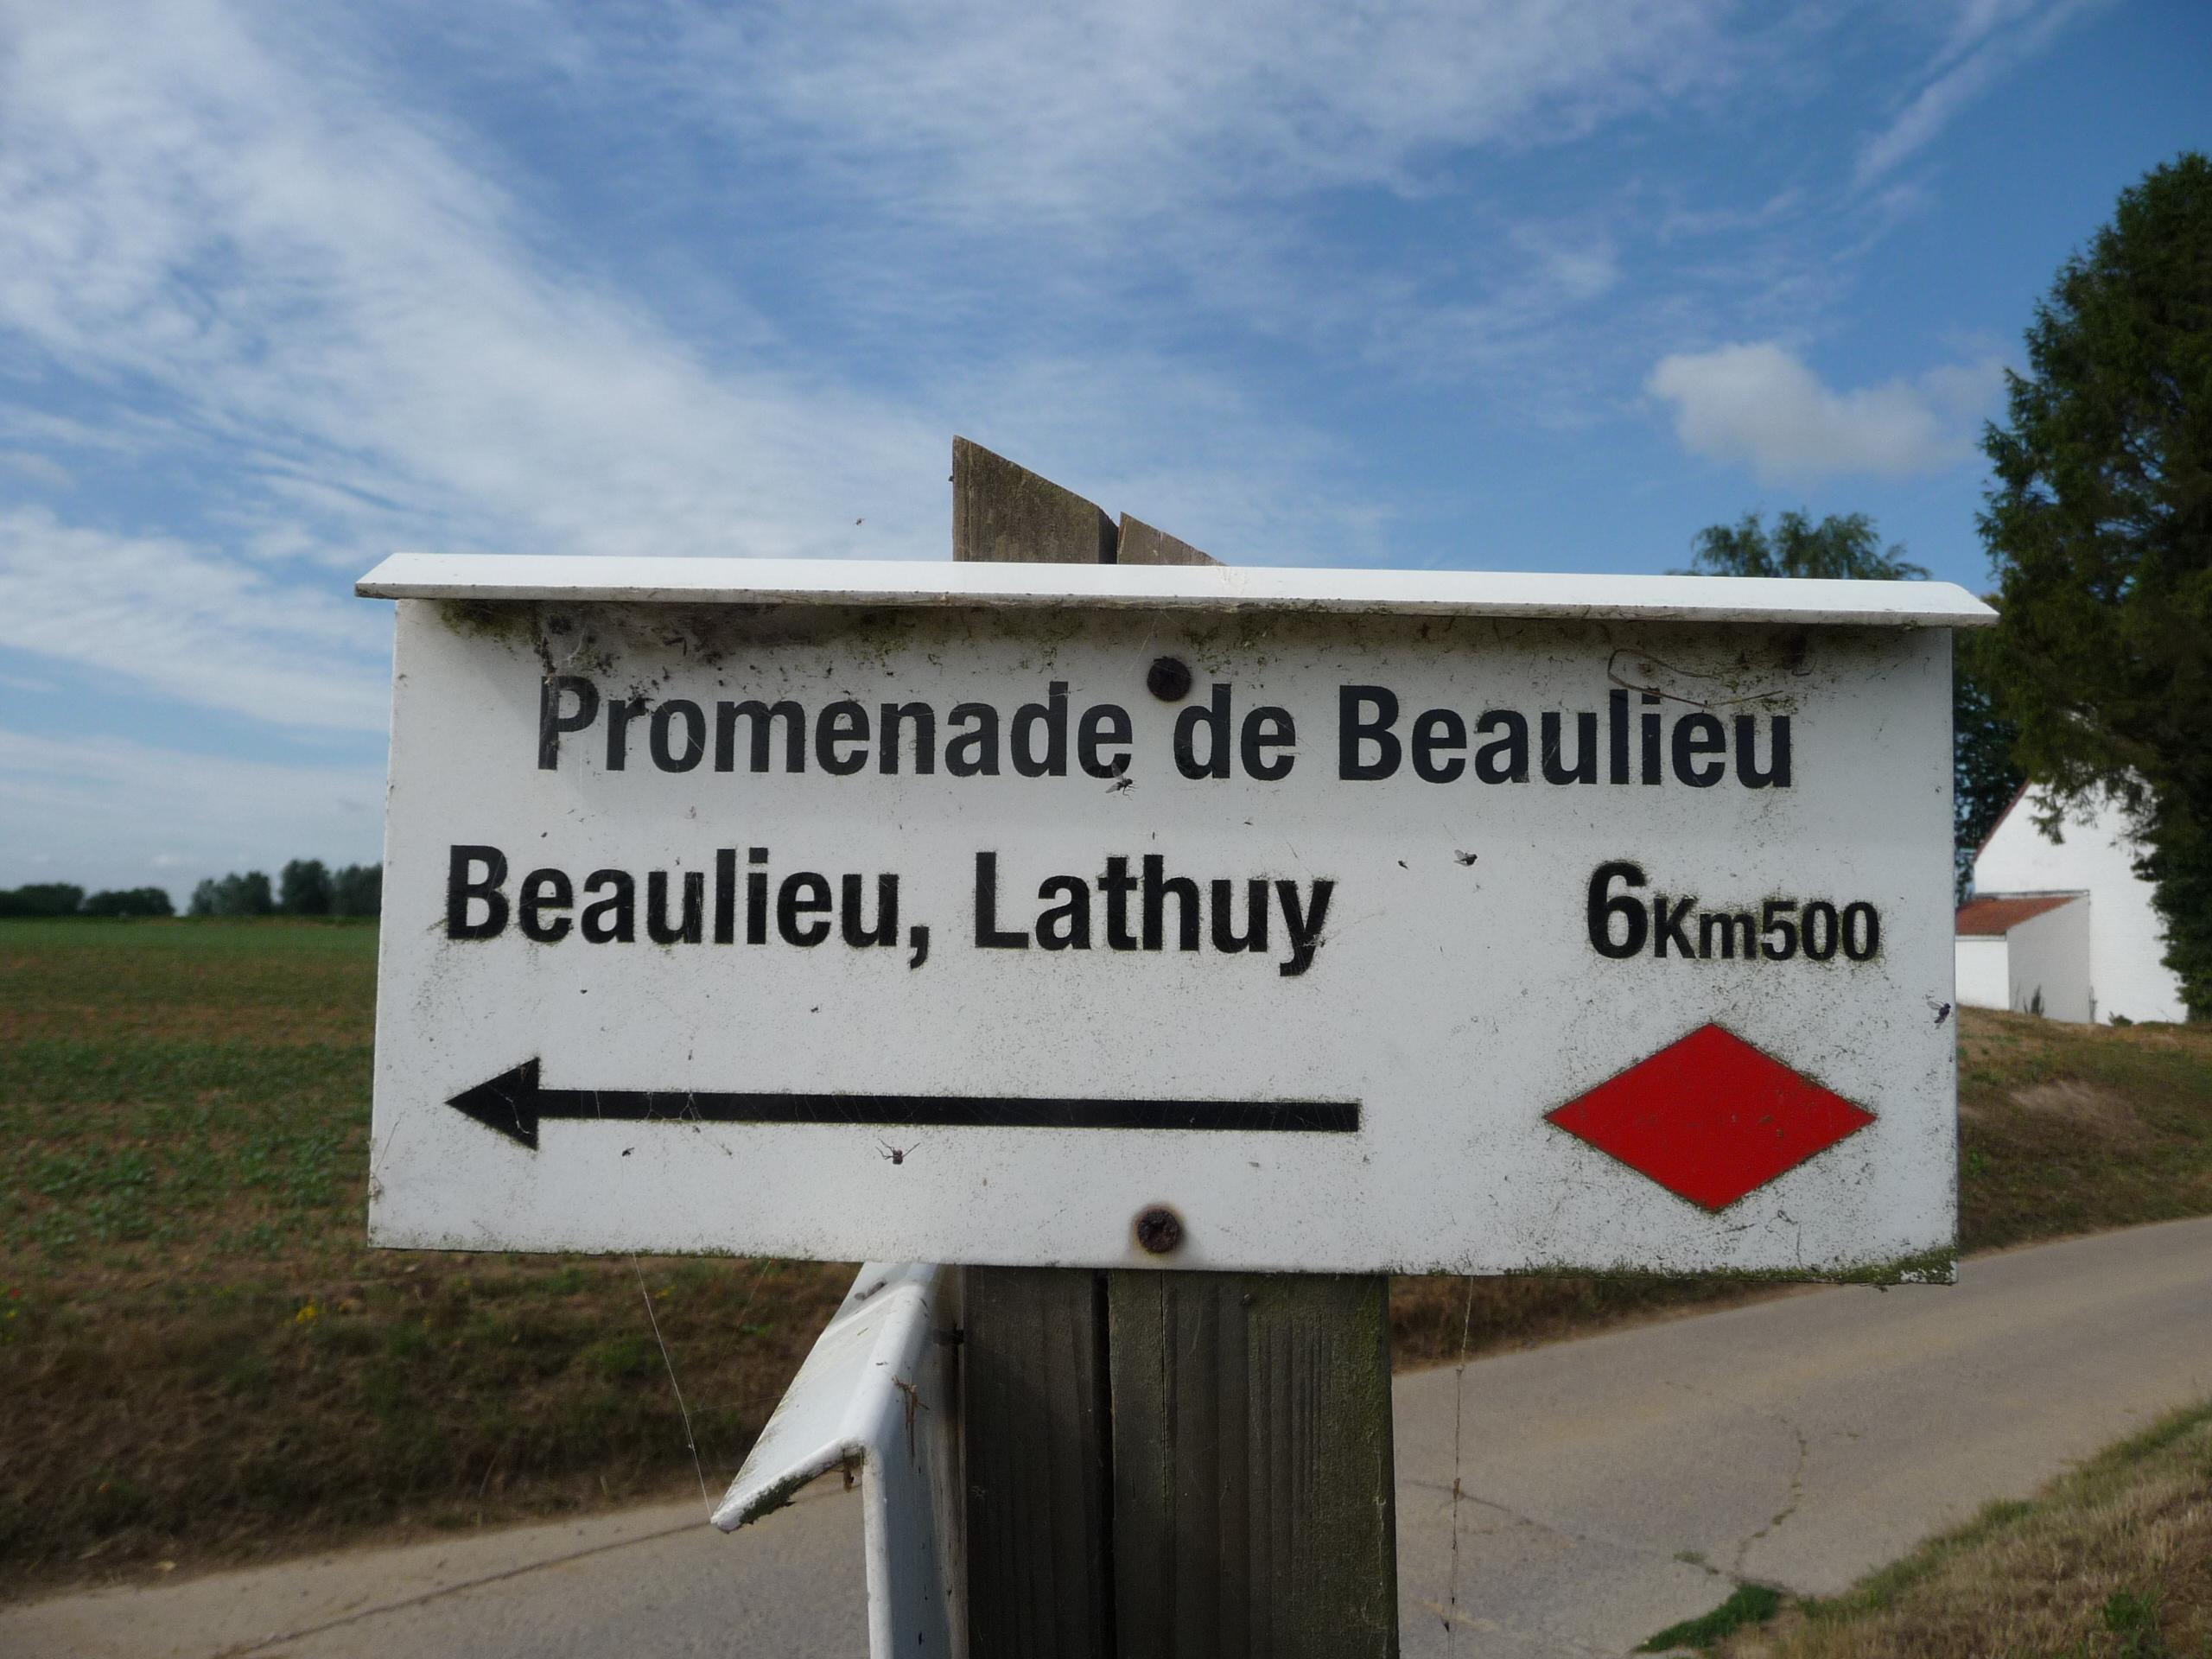 Promenade de Beaulieu signpost